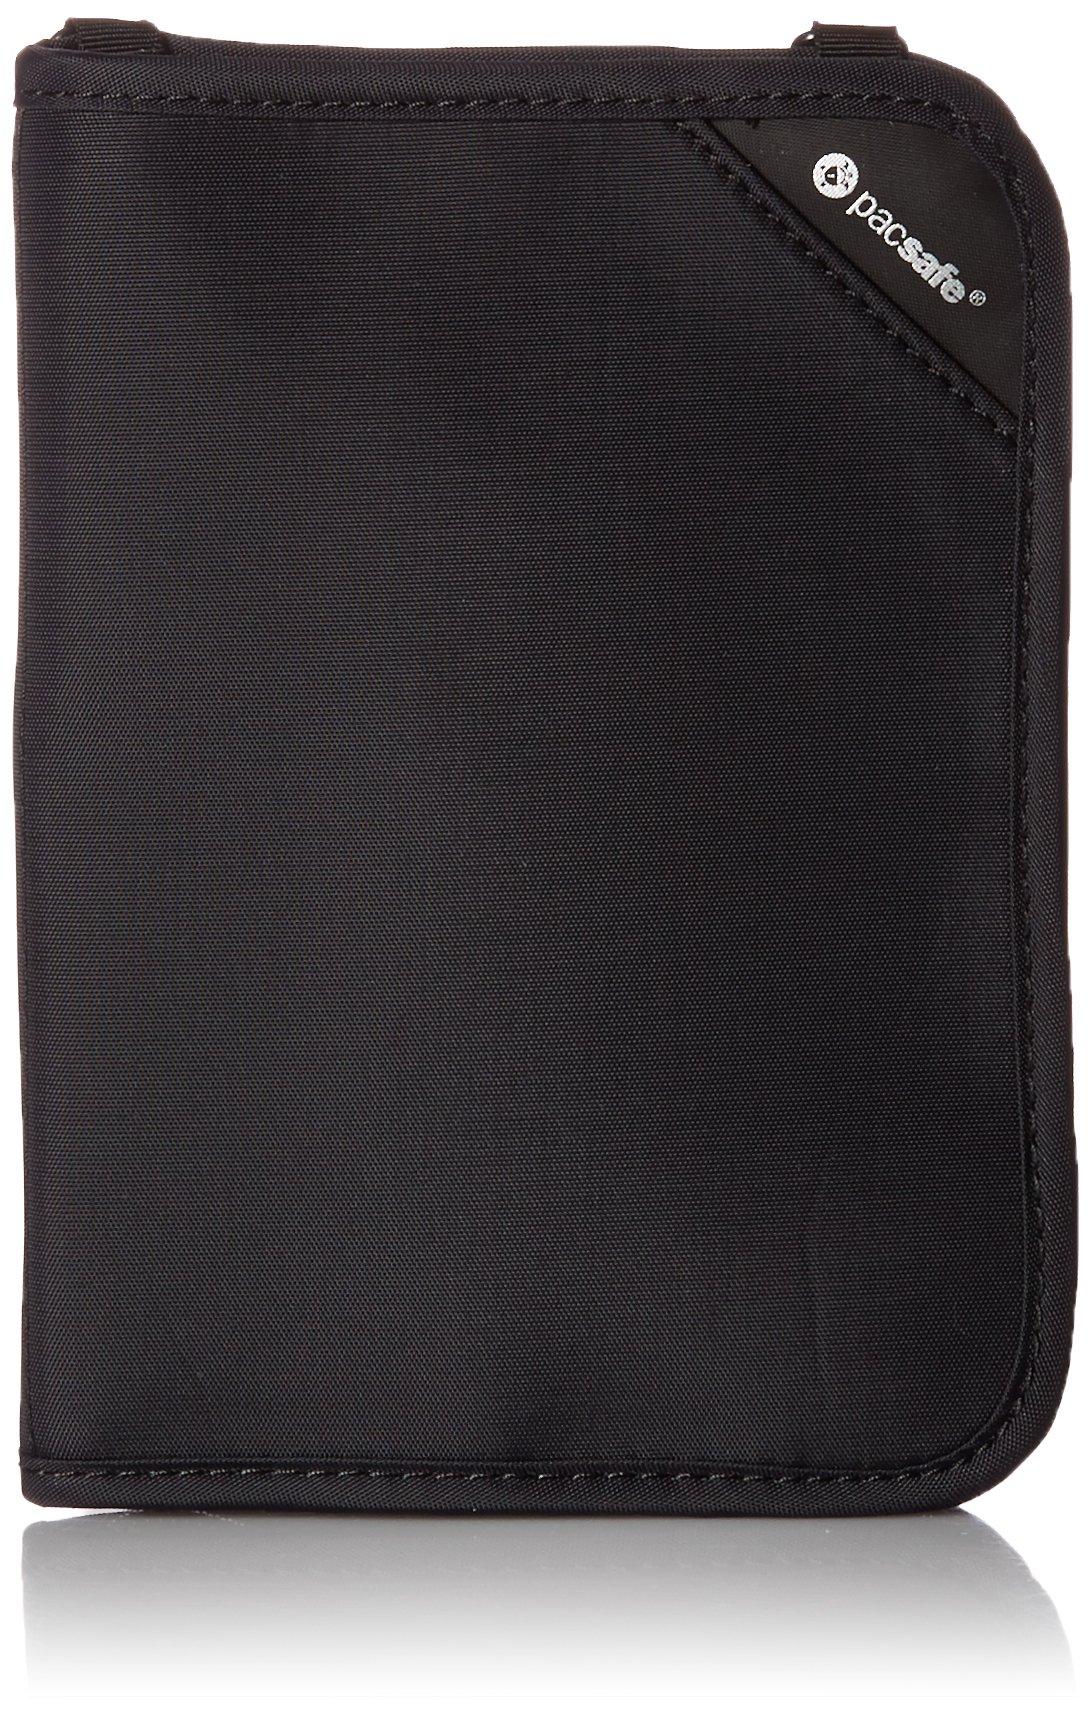 Pacsafe RFIDsafe V150 Anti-Theft RFID Blocking Compact Passport Wallet, Black